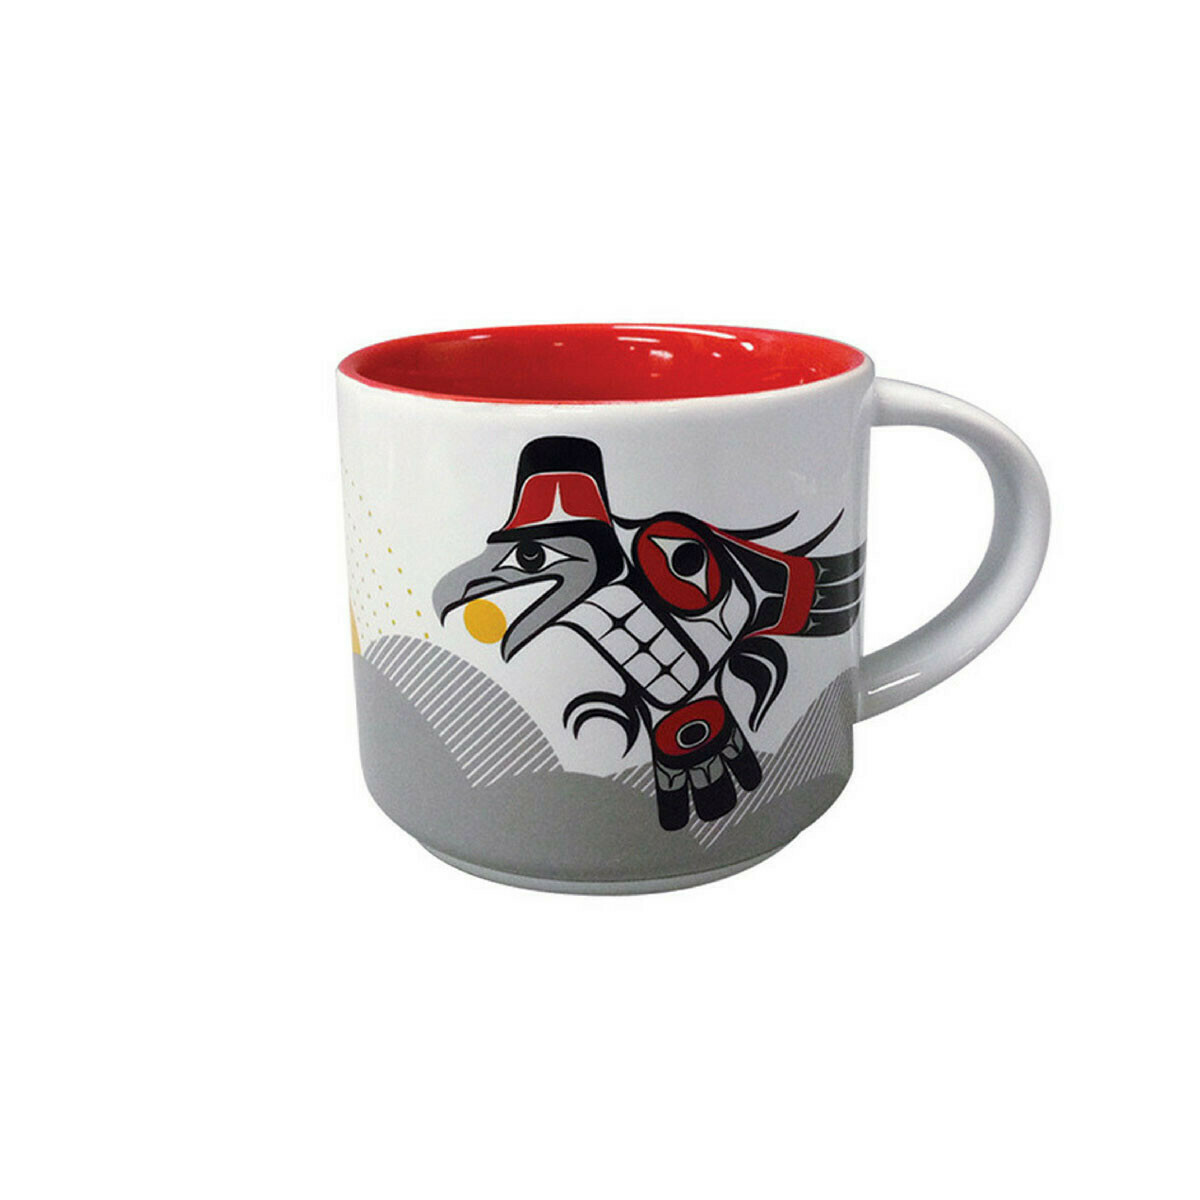 Mug - Raven Brings Light